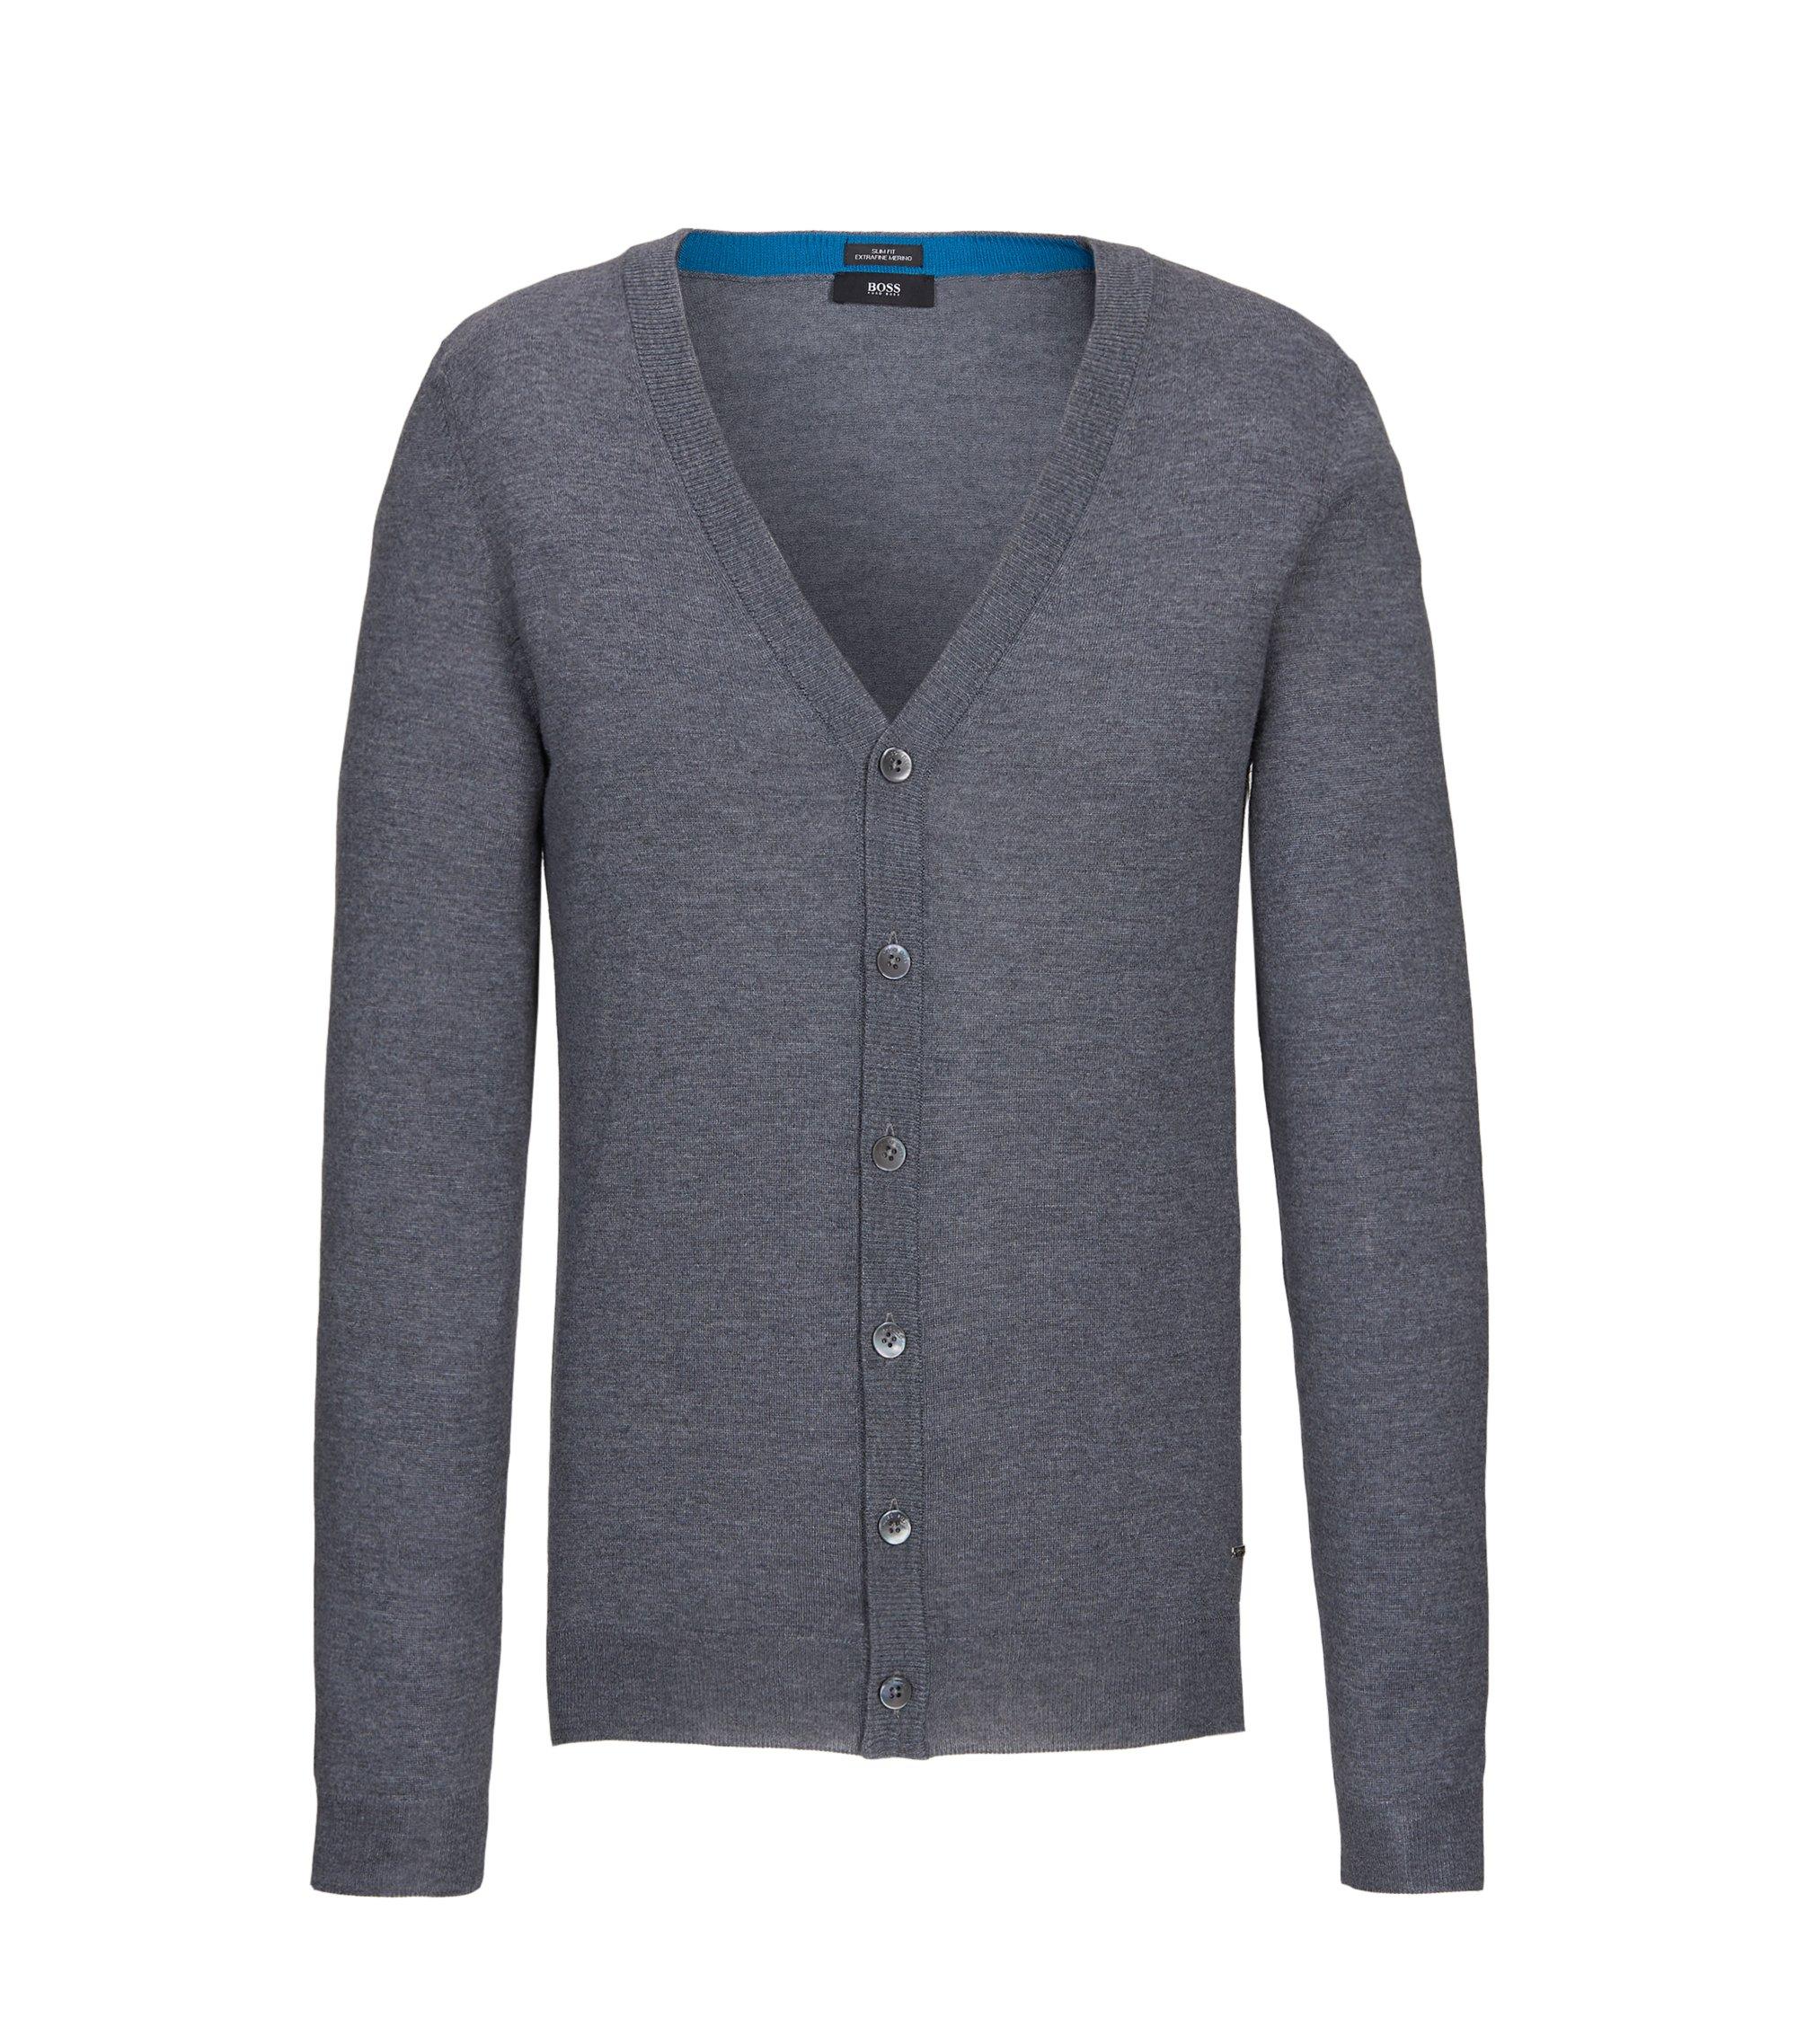 Extra-Fine Virgin Merino Wool Sweater, Slim FIt | Mardon M, Grey